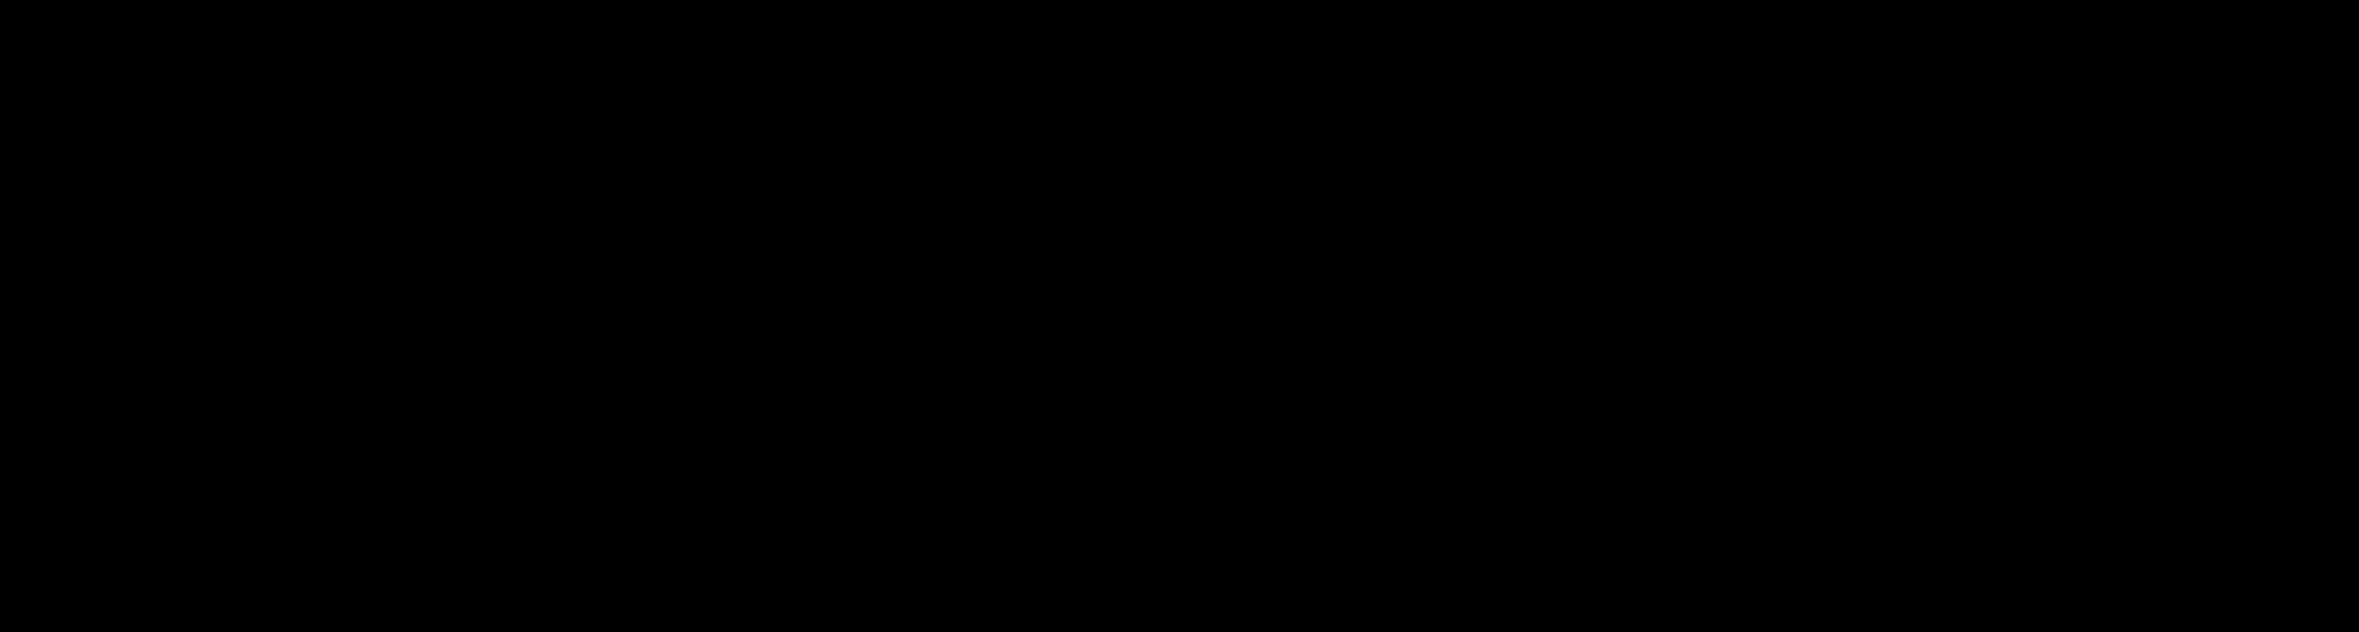 Мажорные секстаккорды